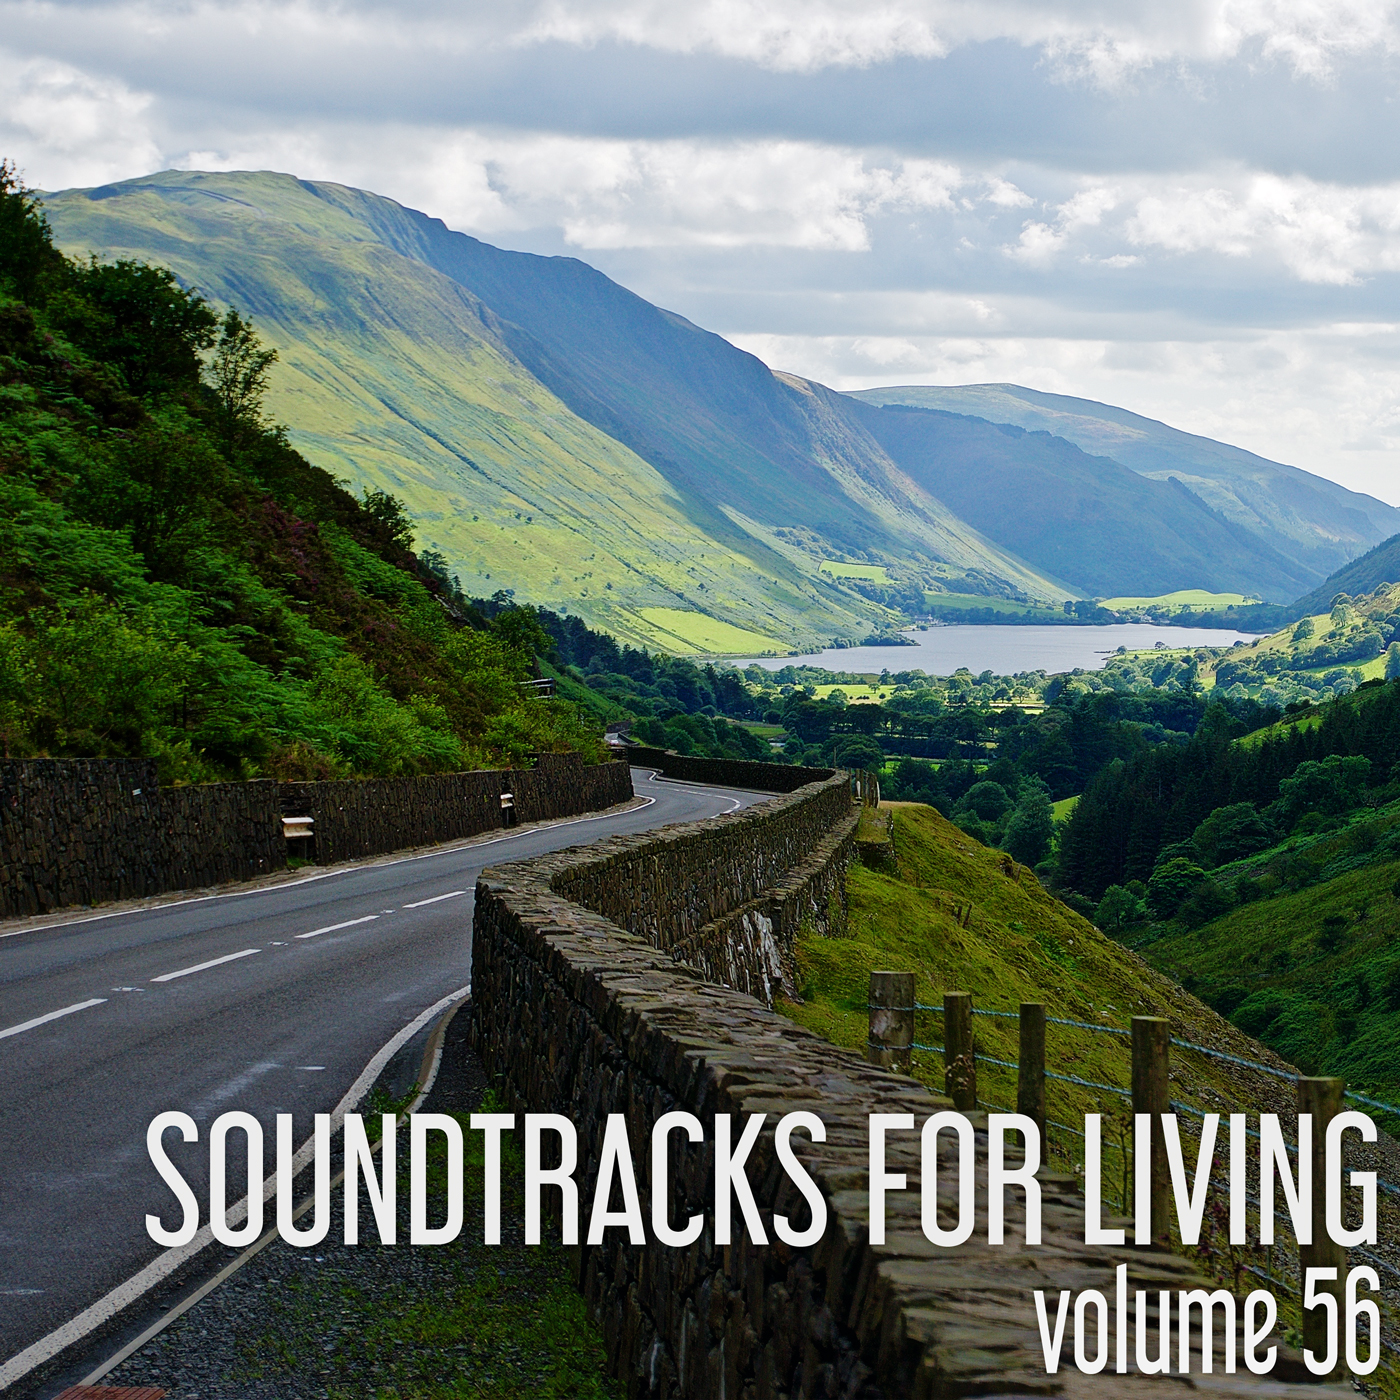 SFL - Volume 56